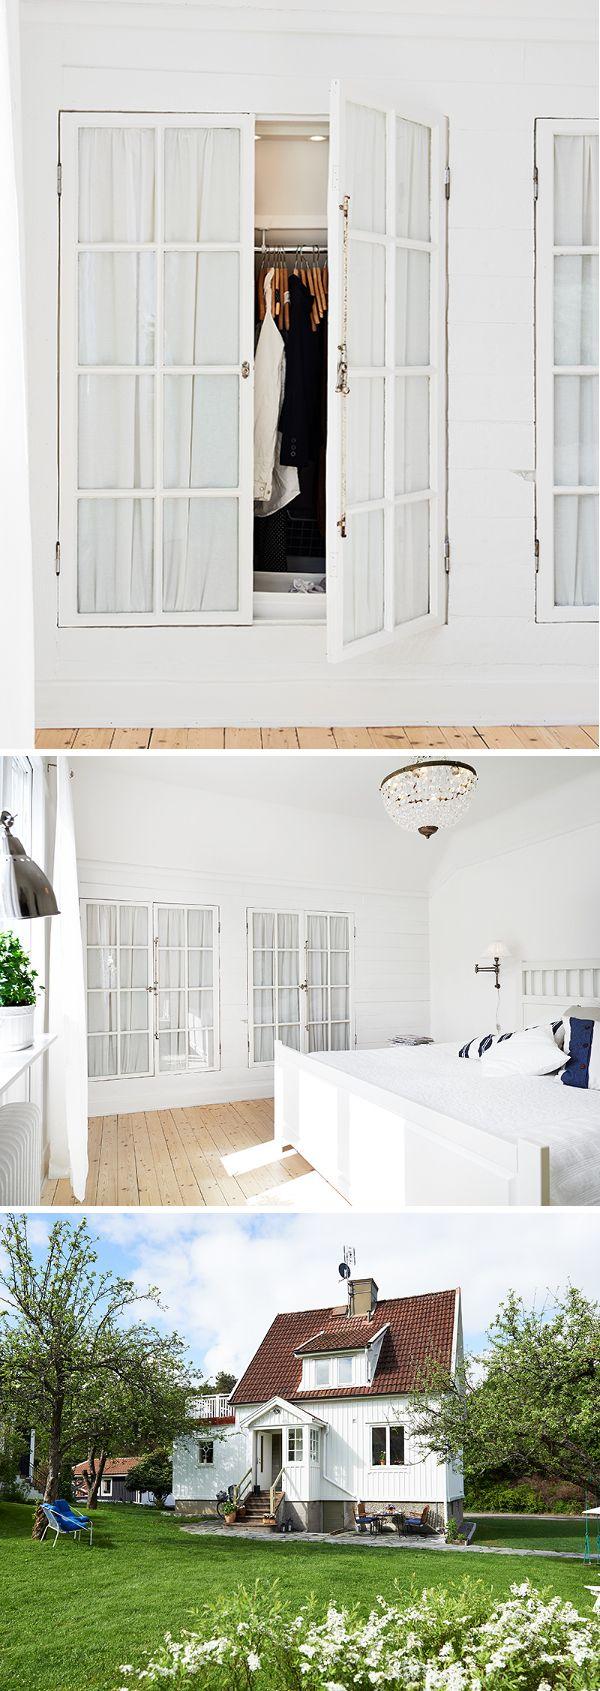 Kreativ inredning - inspirerande inredningsblogg! Check out the awesome closet....